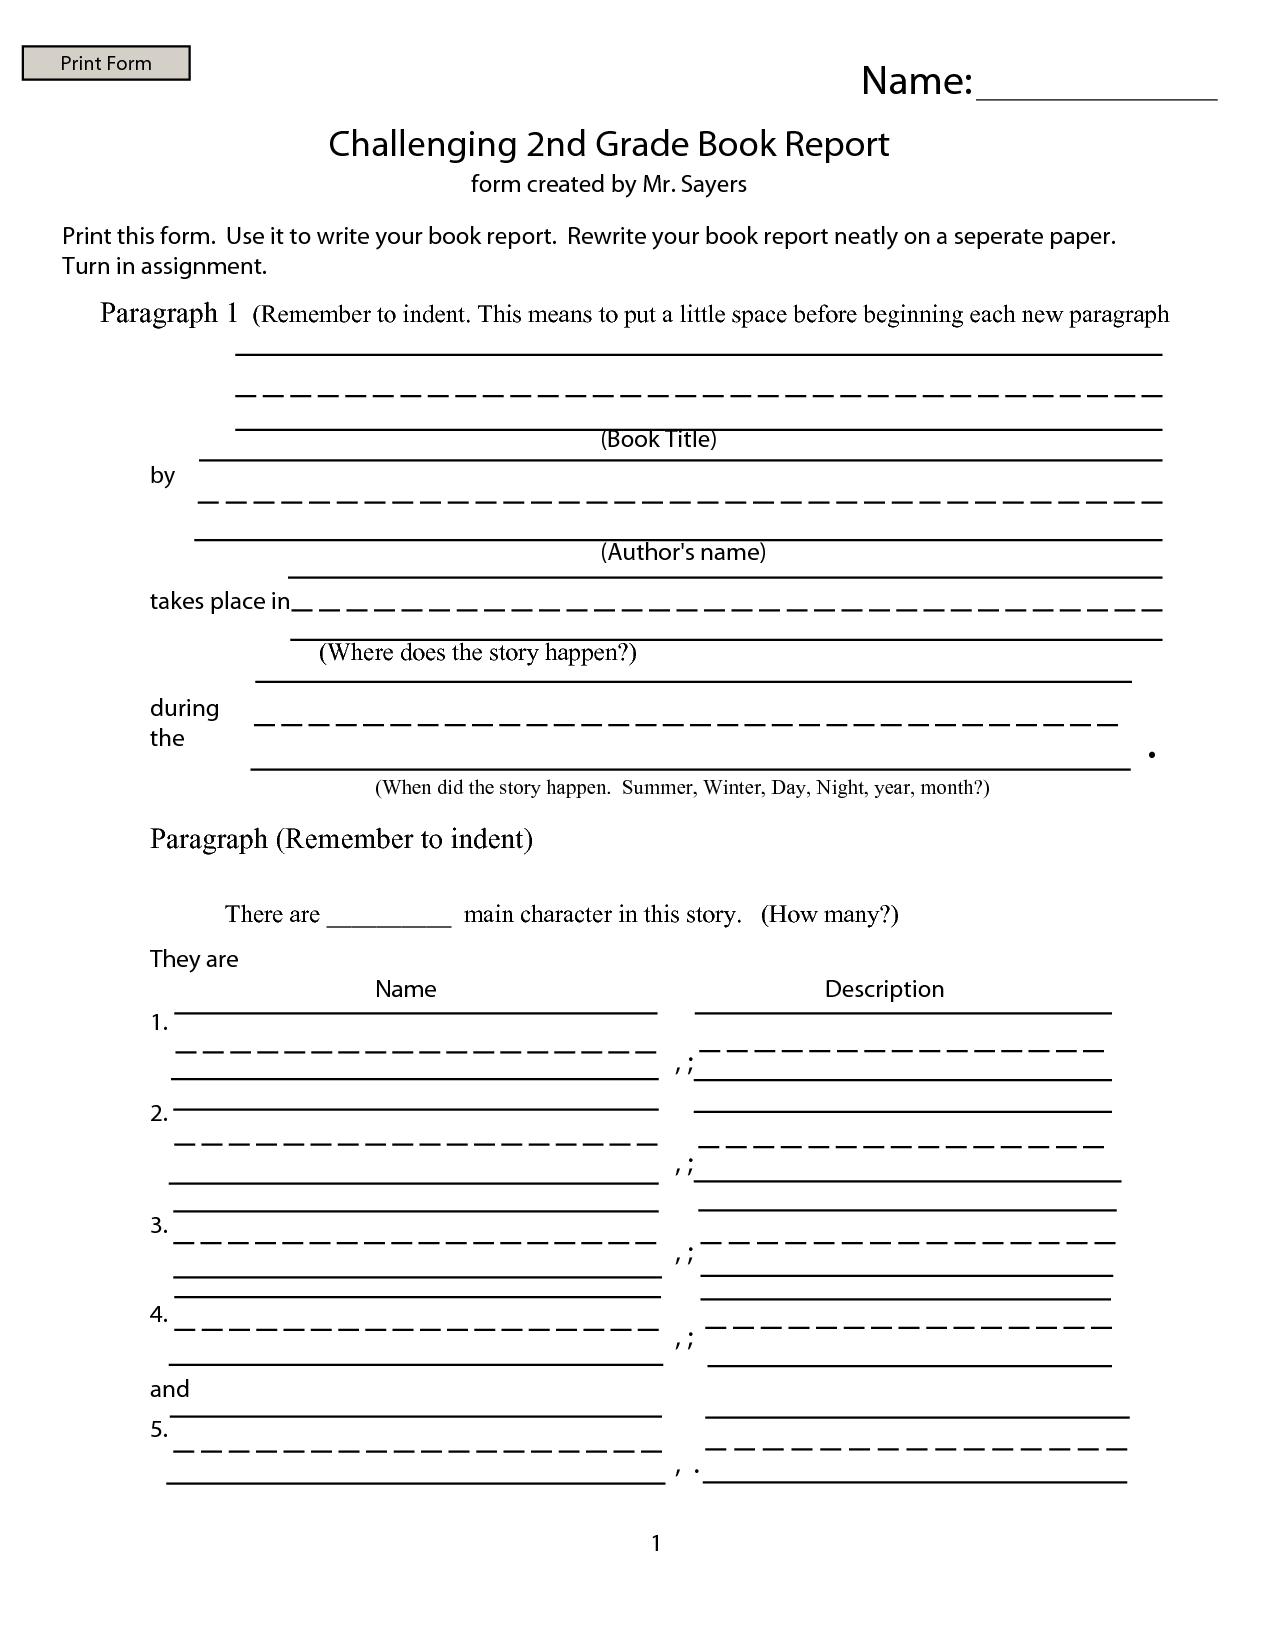 2nd grade Book Report - Google Search | Homeschooling IDEAS ...